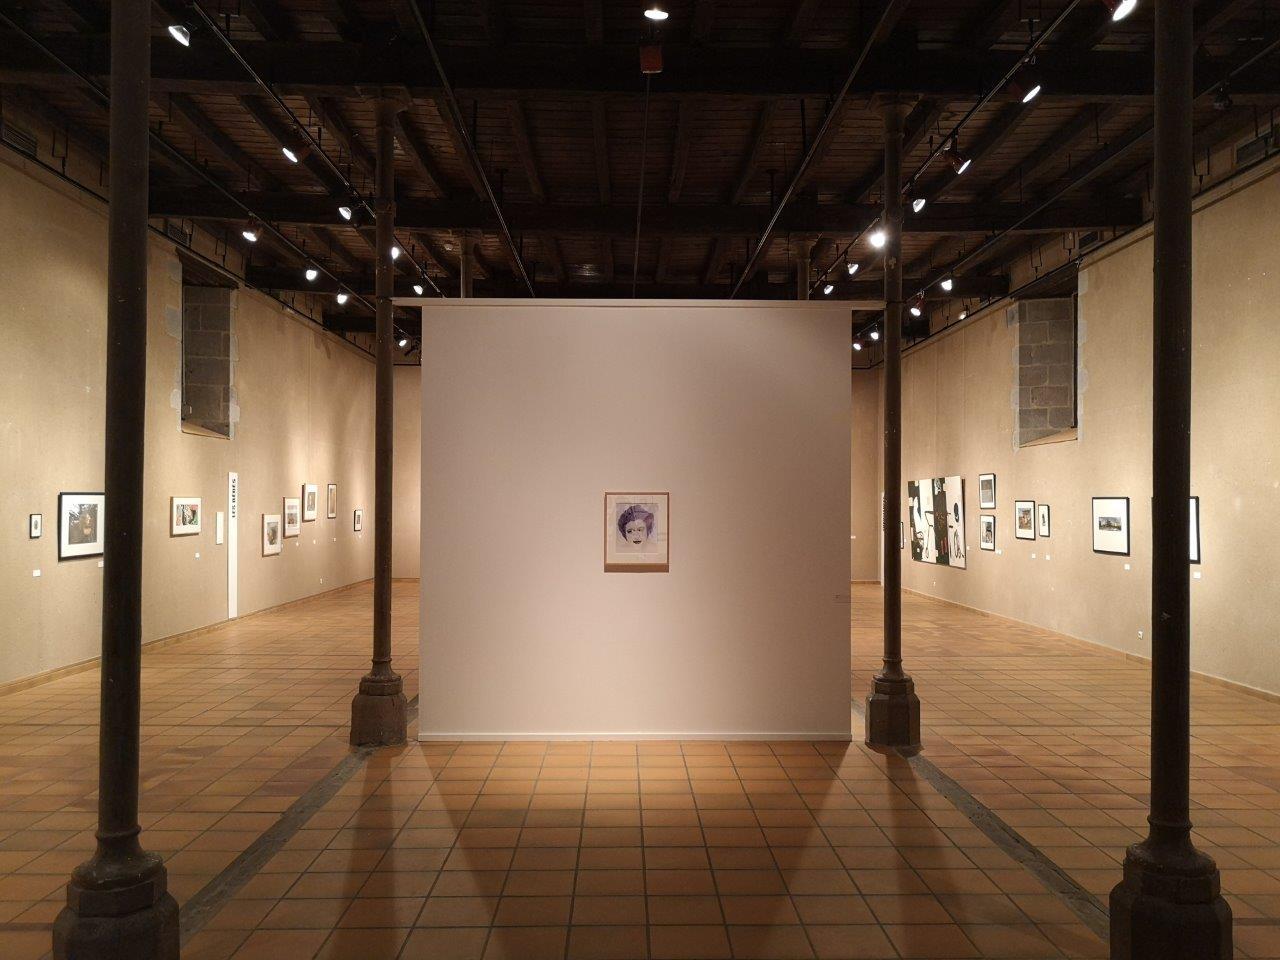 Lorraine Audric: Berlin/Trizac